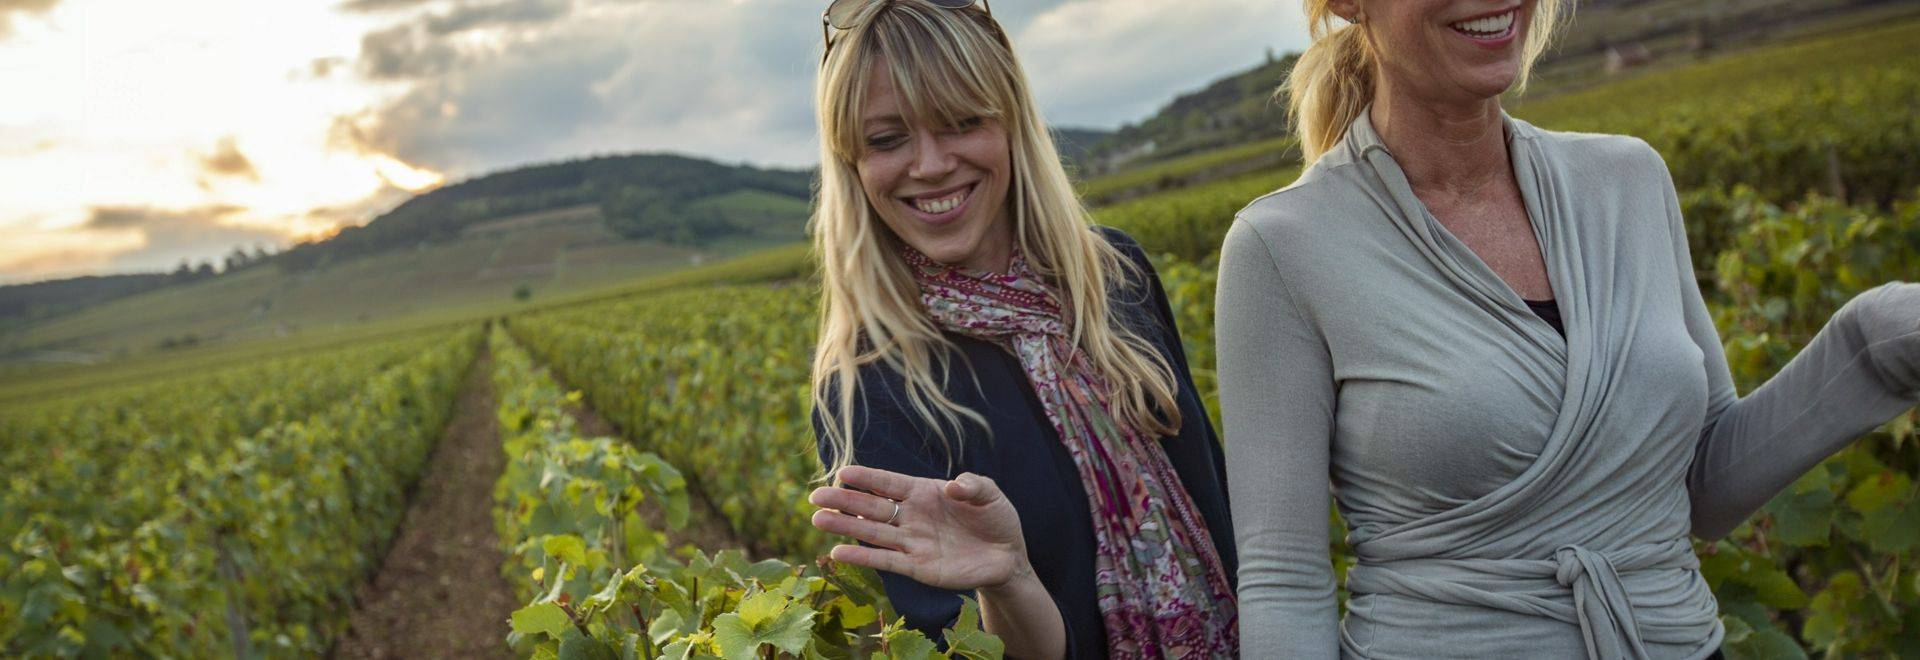 Italy Vineyard Sunset Travellers - IMG1050 Lg RGB.jpg